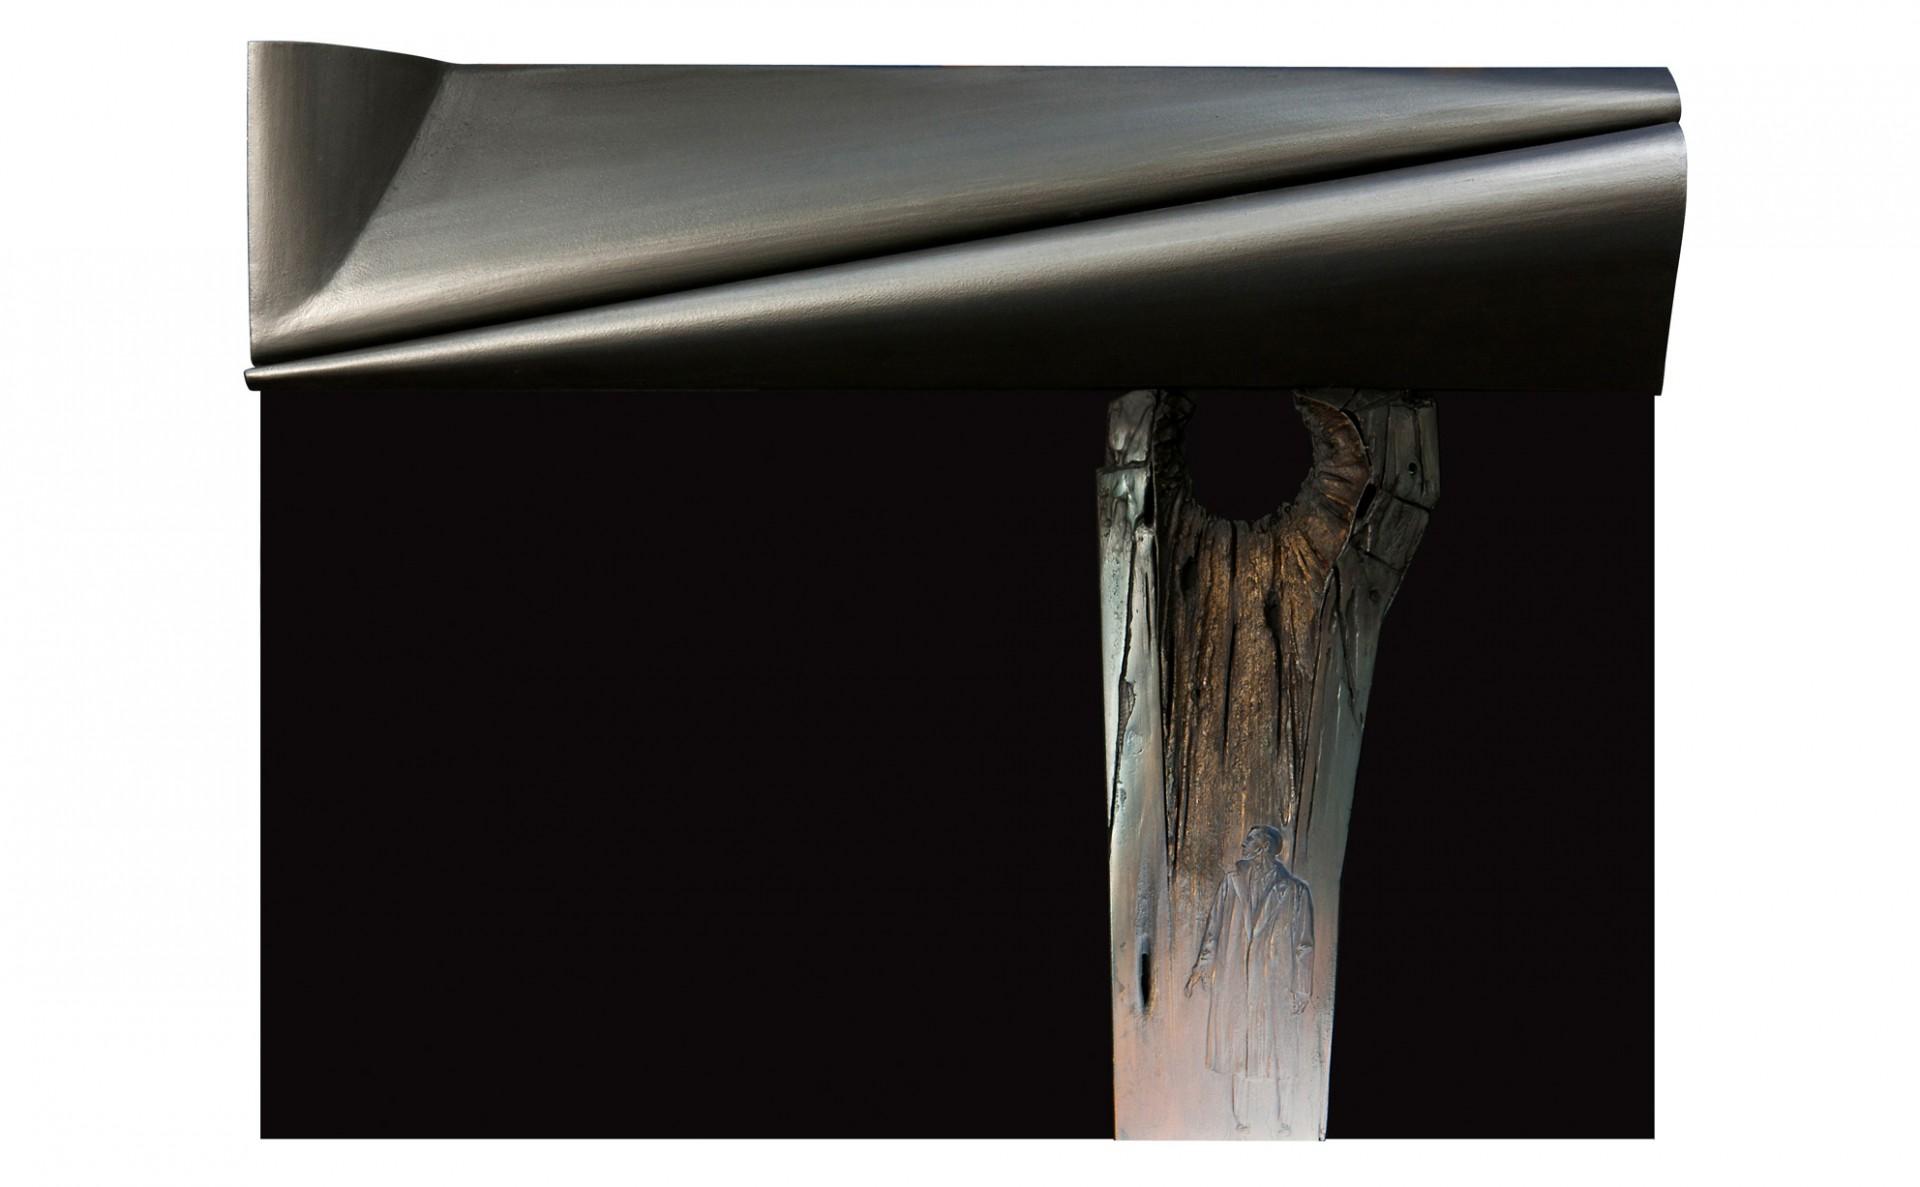 Forra 2011 – modello - cm 82,5x64x9,5 fiberglass, acrylic on cardboard